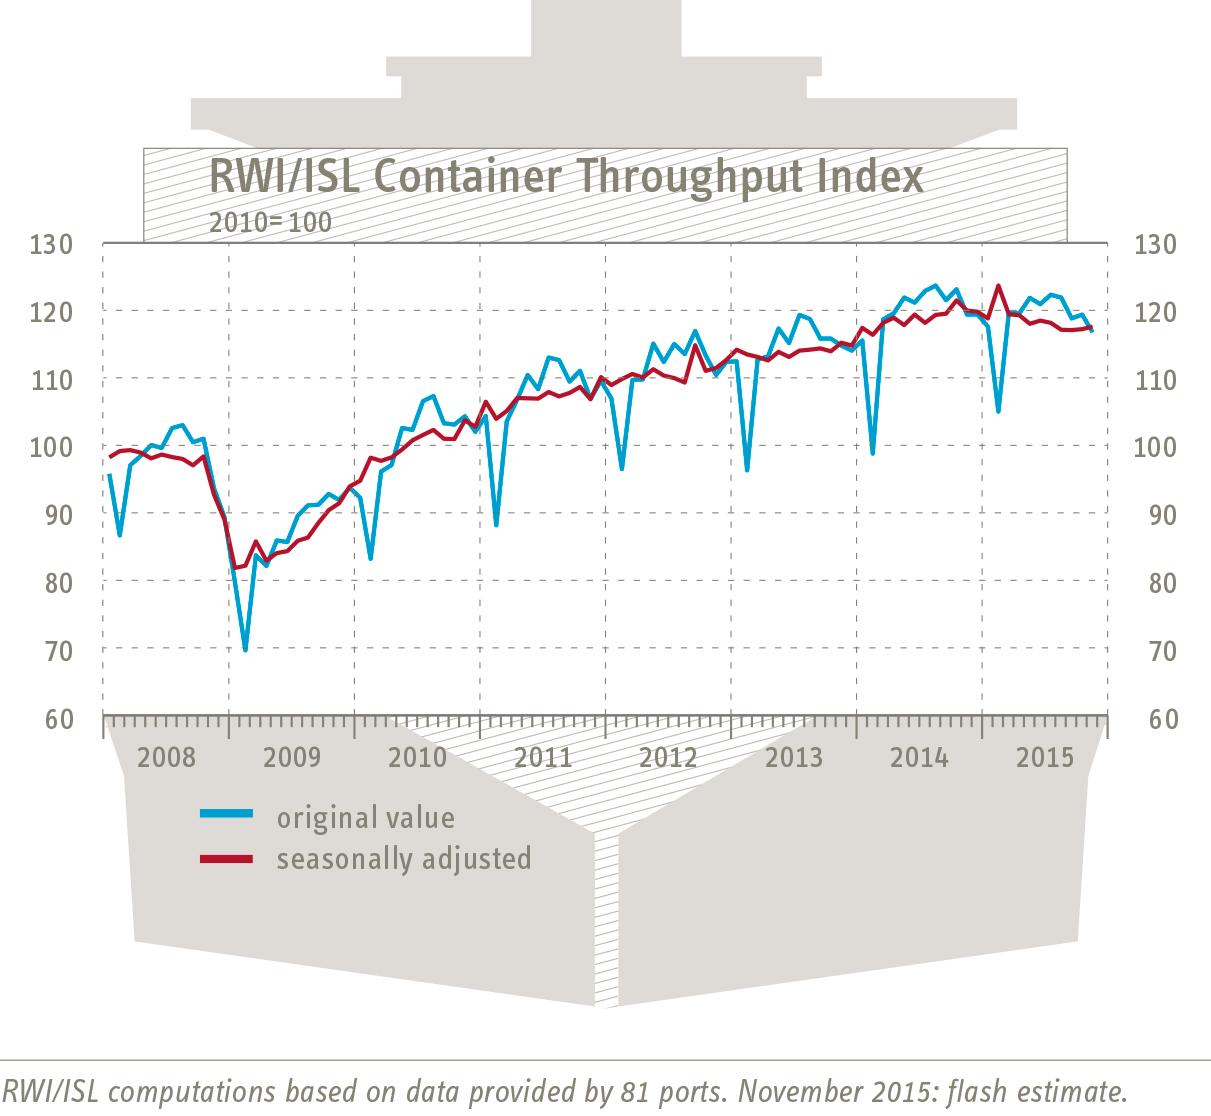 containerumschlag-index_151222_engl